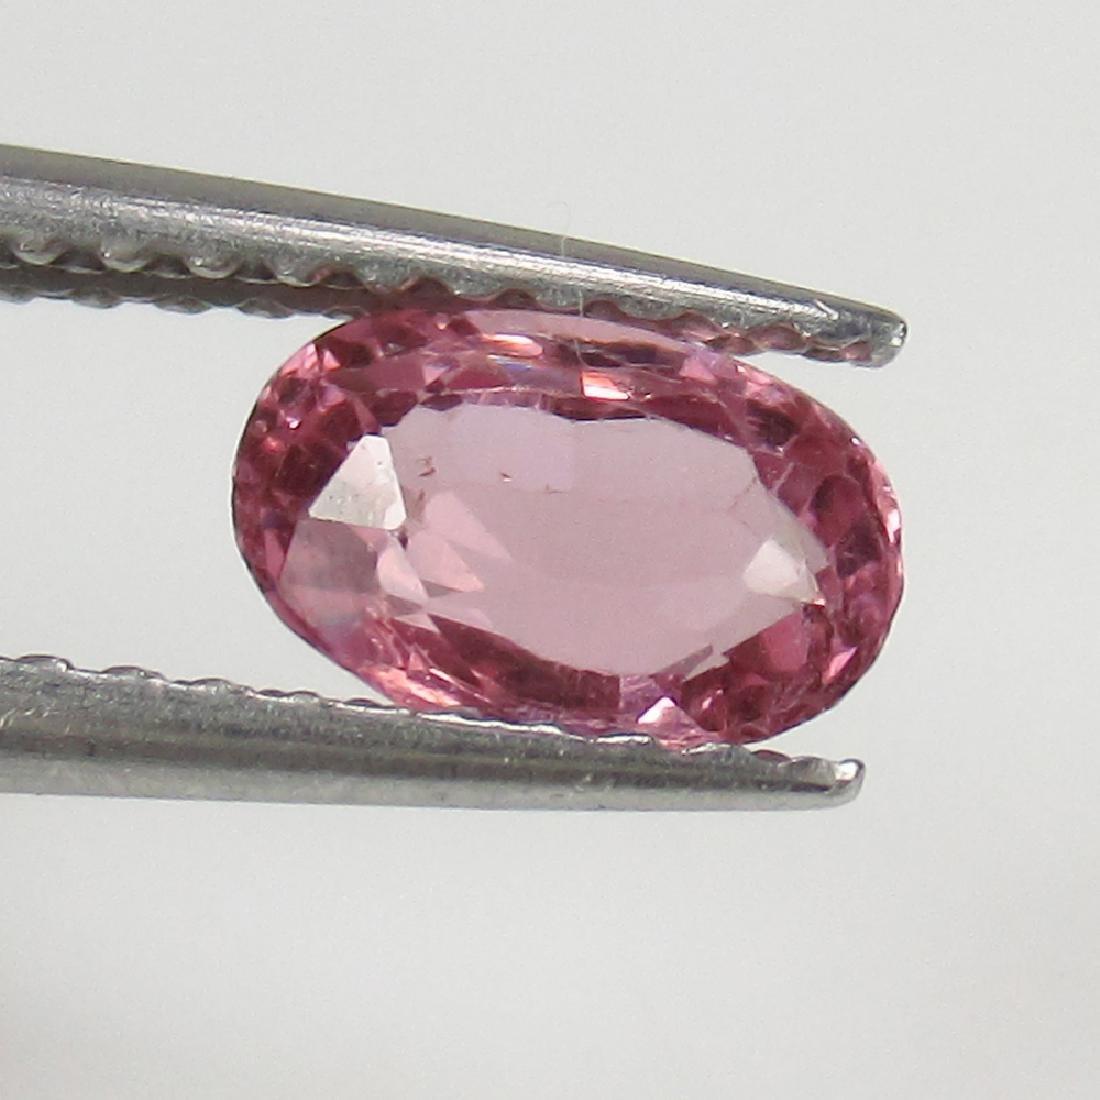 0.73 Ct IGI Certified Pyrope Pink Rhodolite Garnet